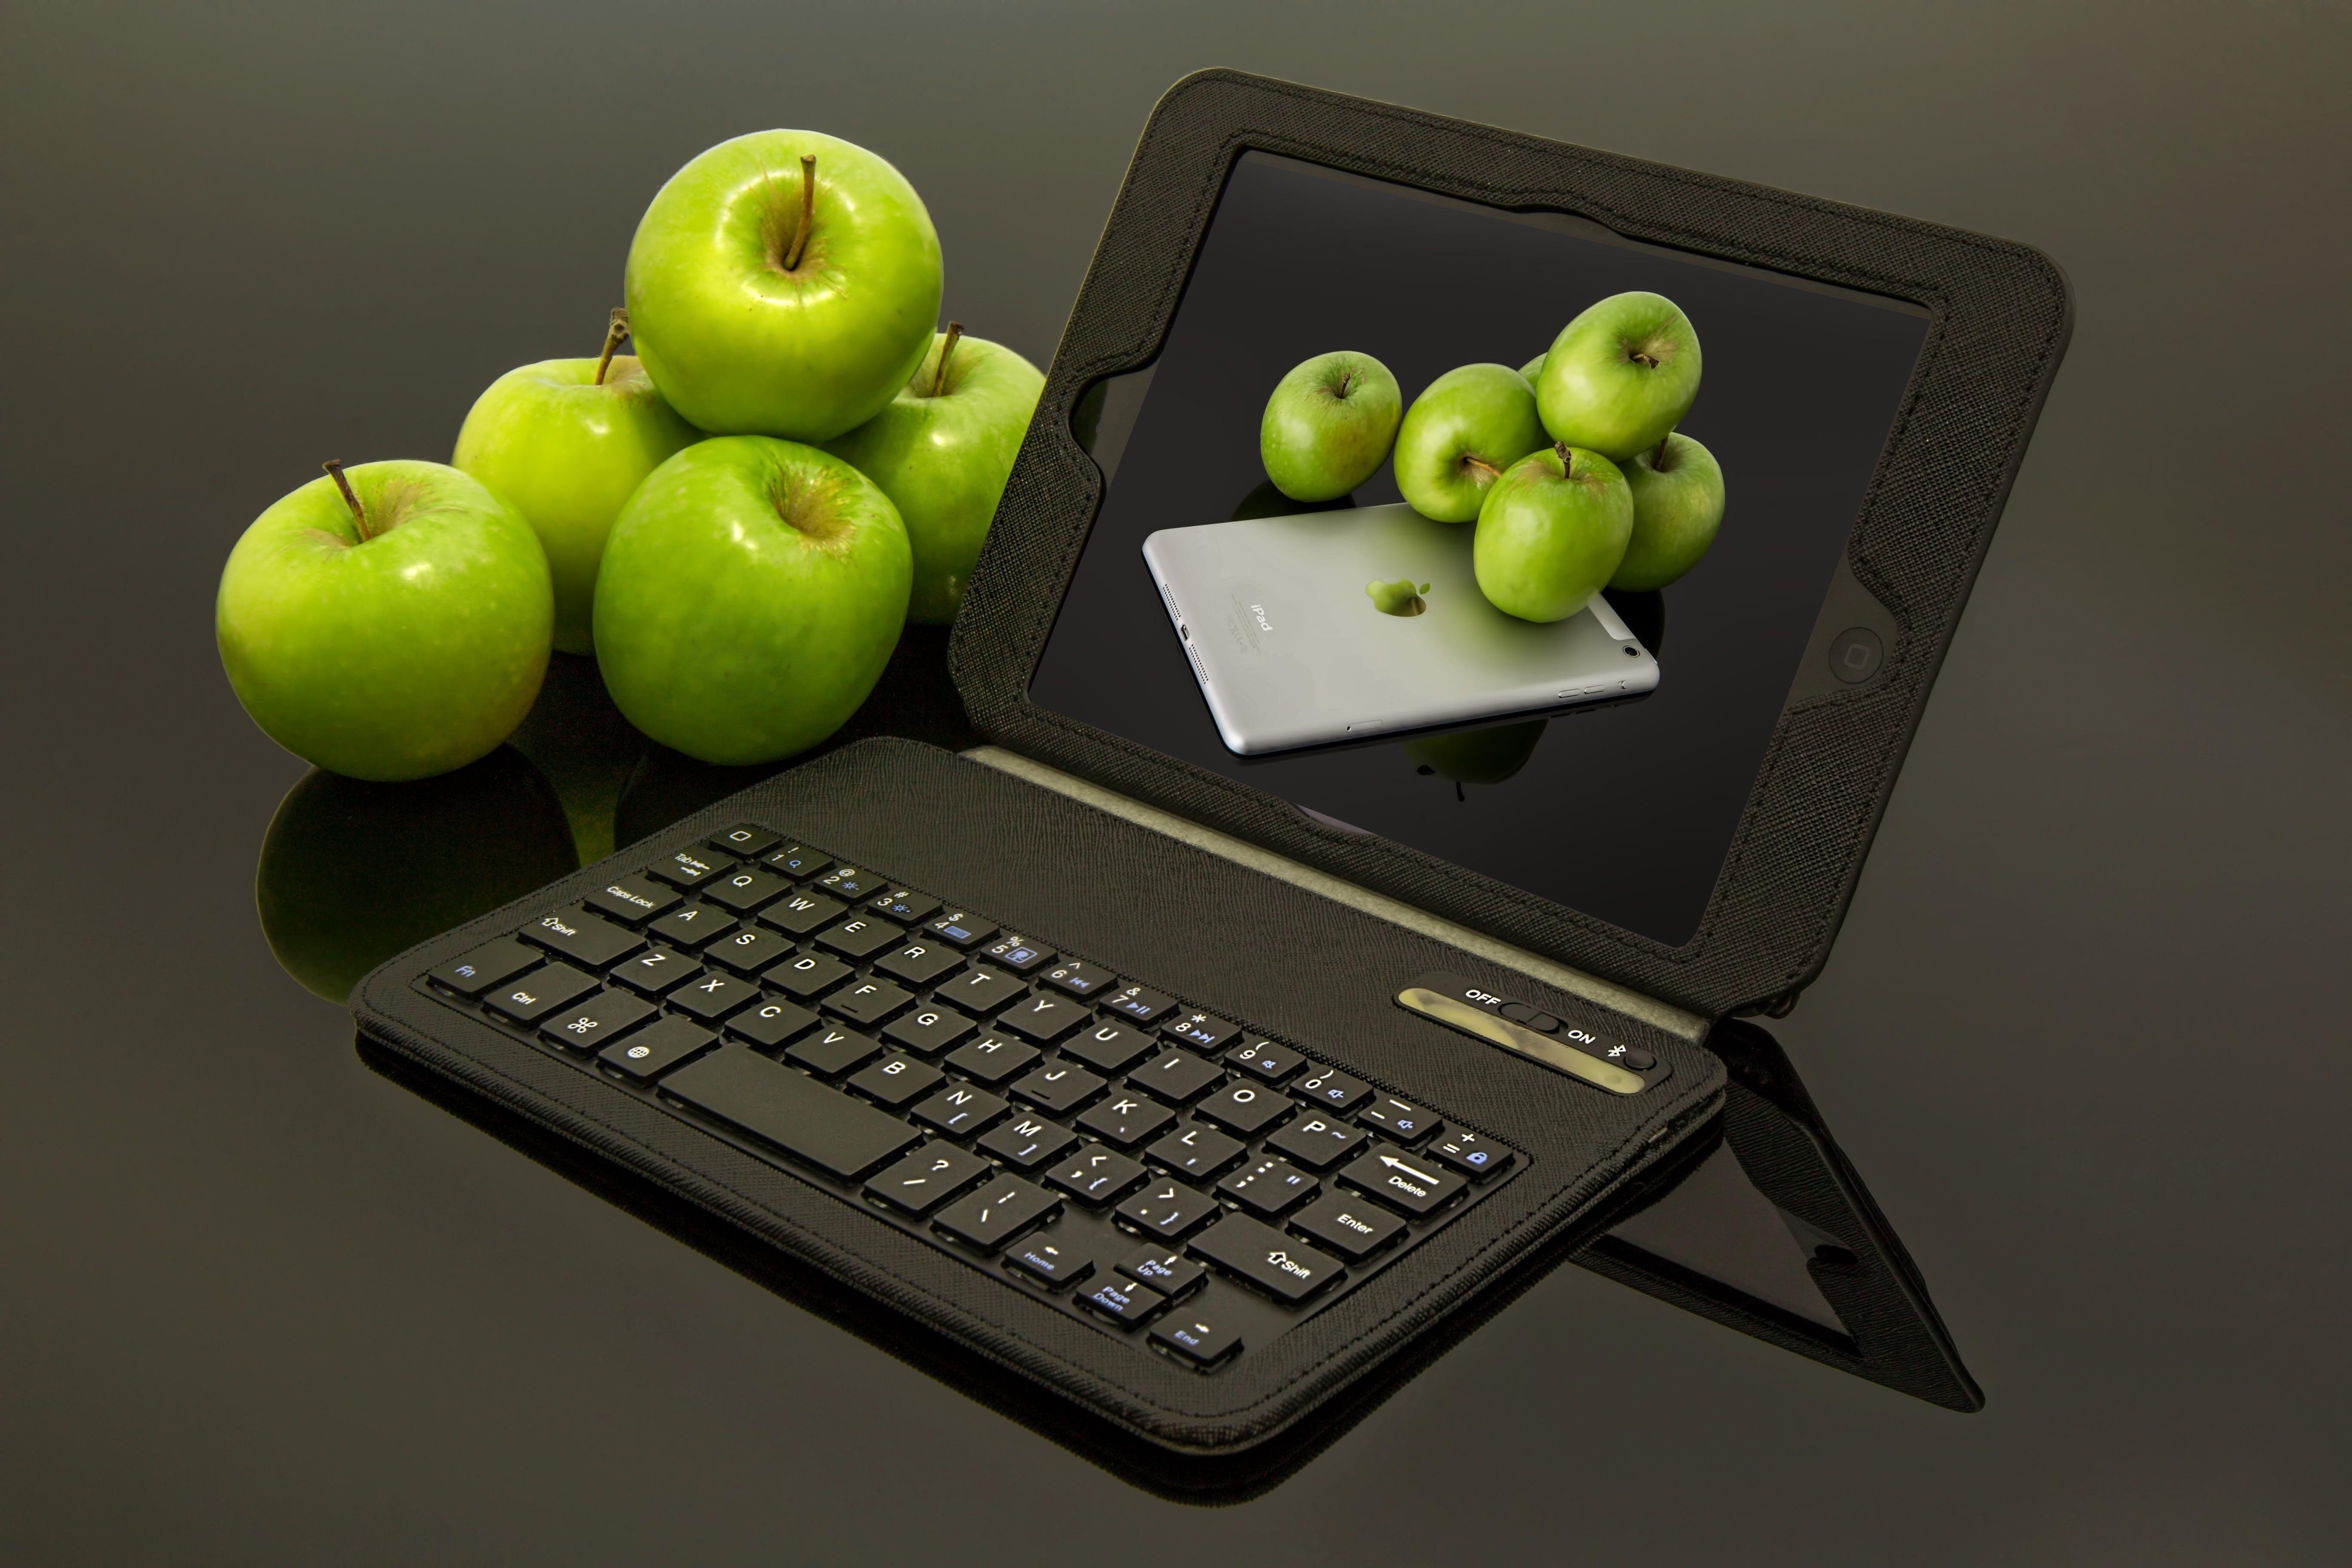 apple, apples, fruits